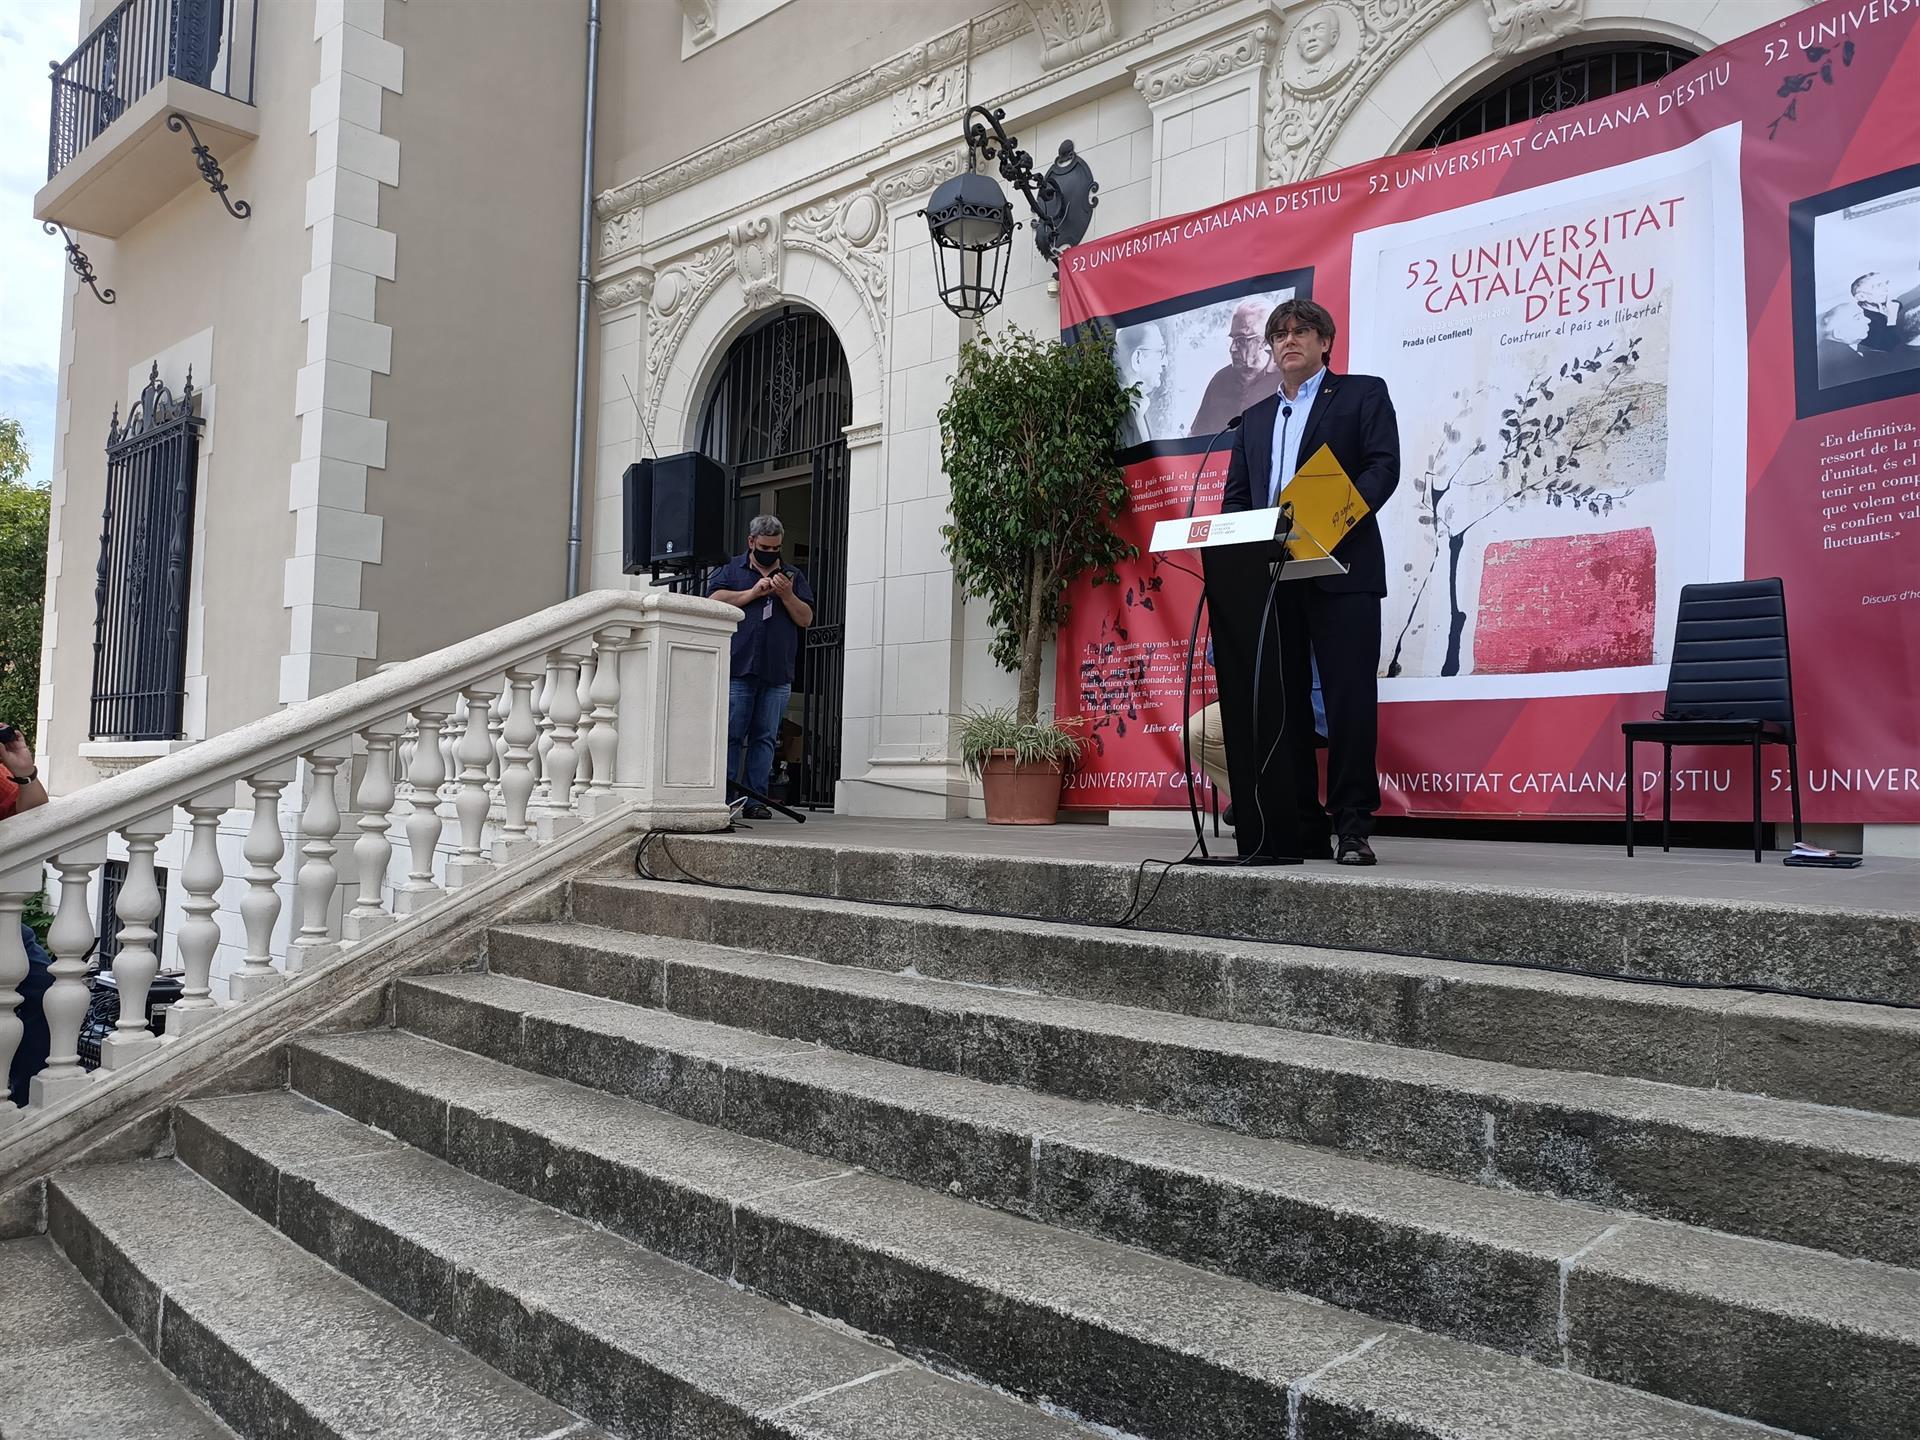 Puigdemont en 2019 en un discurso en la UCE